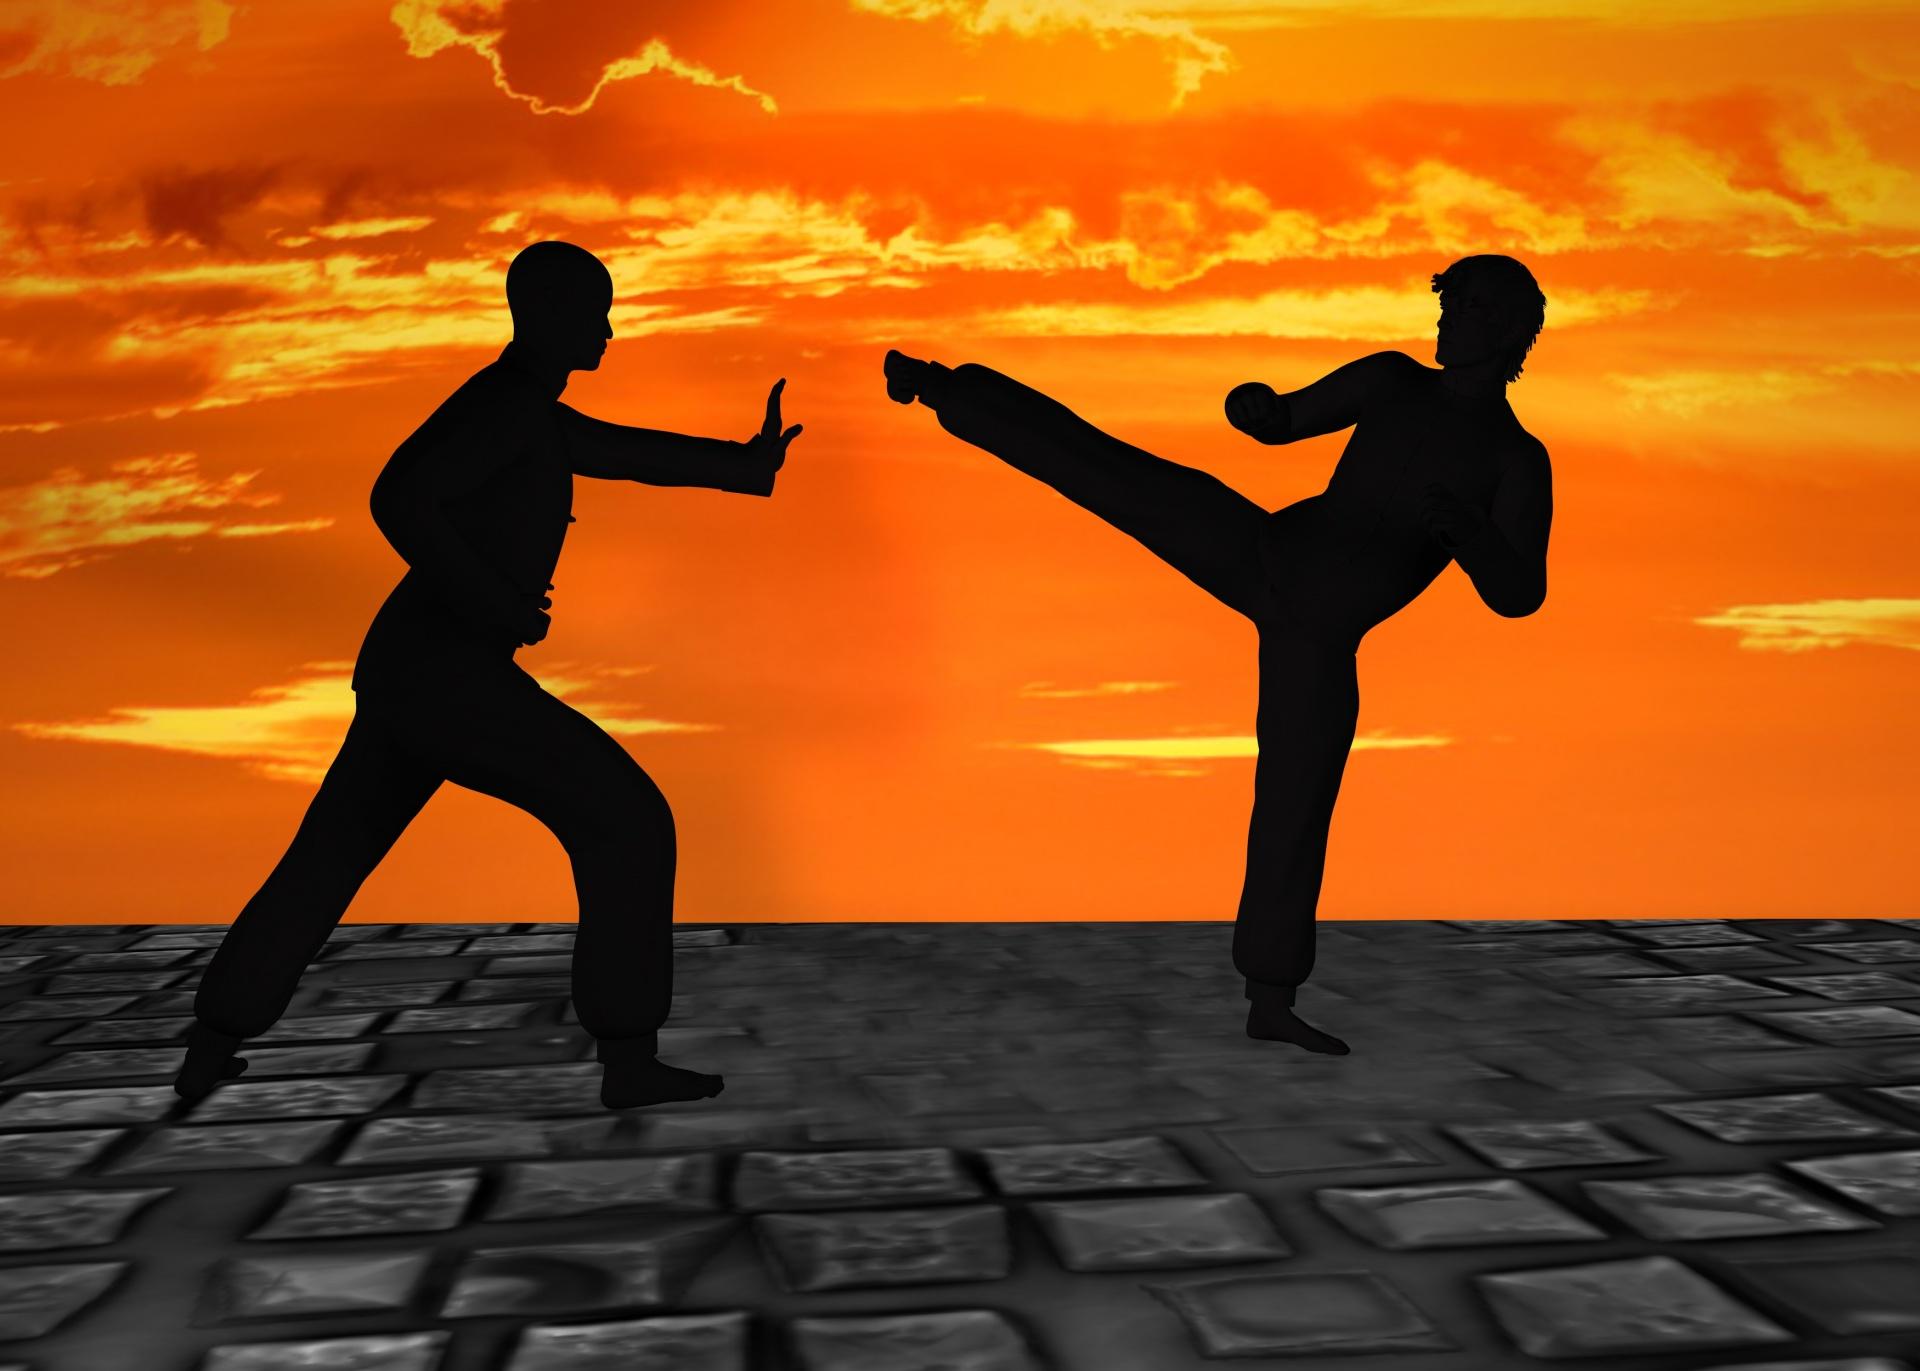 arte martiale